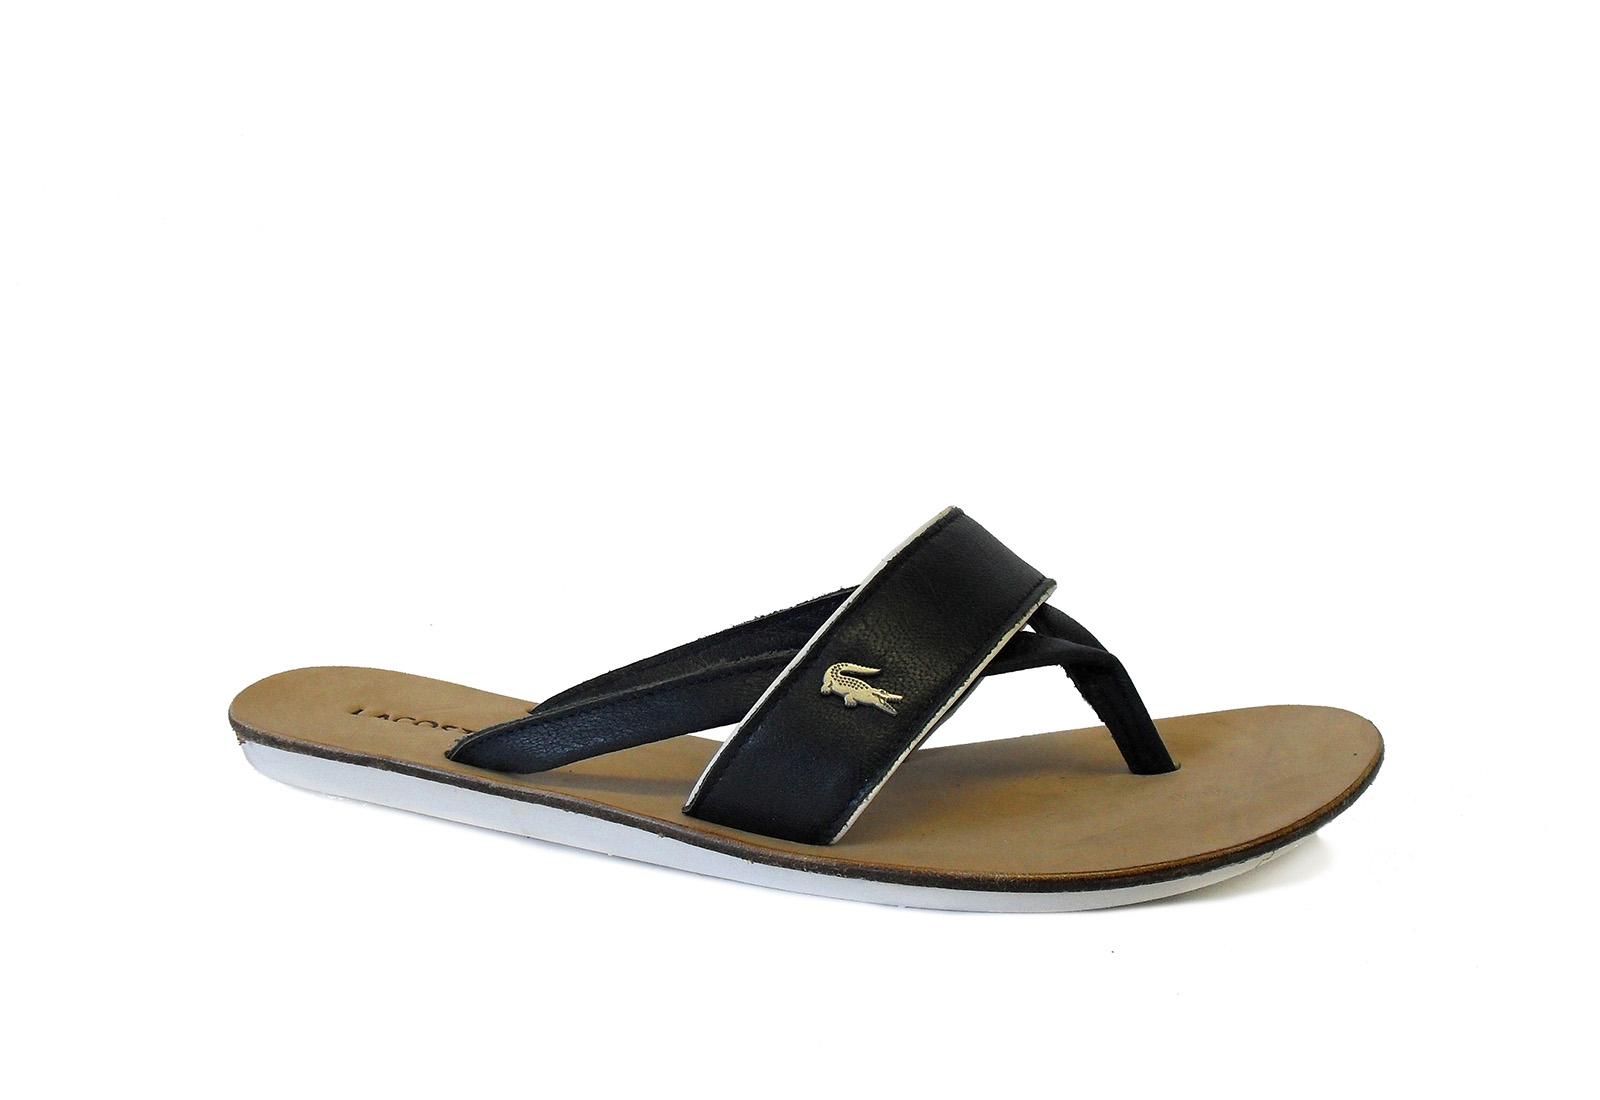 Lacoste Papucs - Baena - 13S-1130-003 - Office Shoes Magyarország d6e6c4b0d0